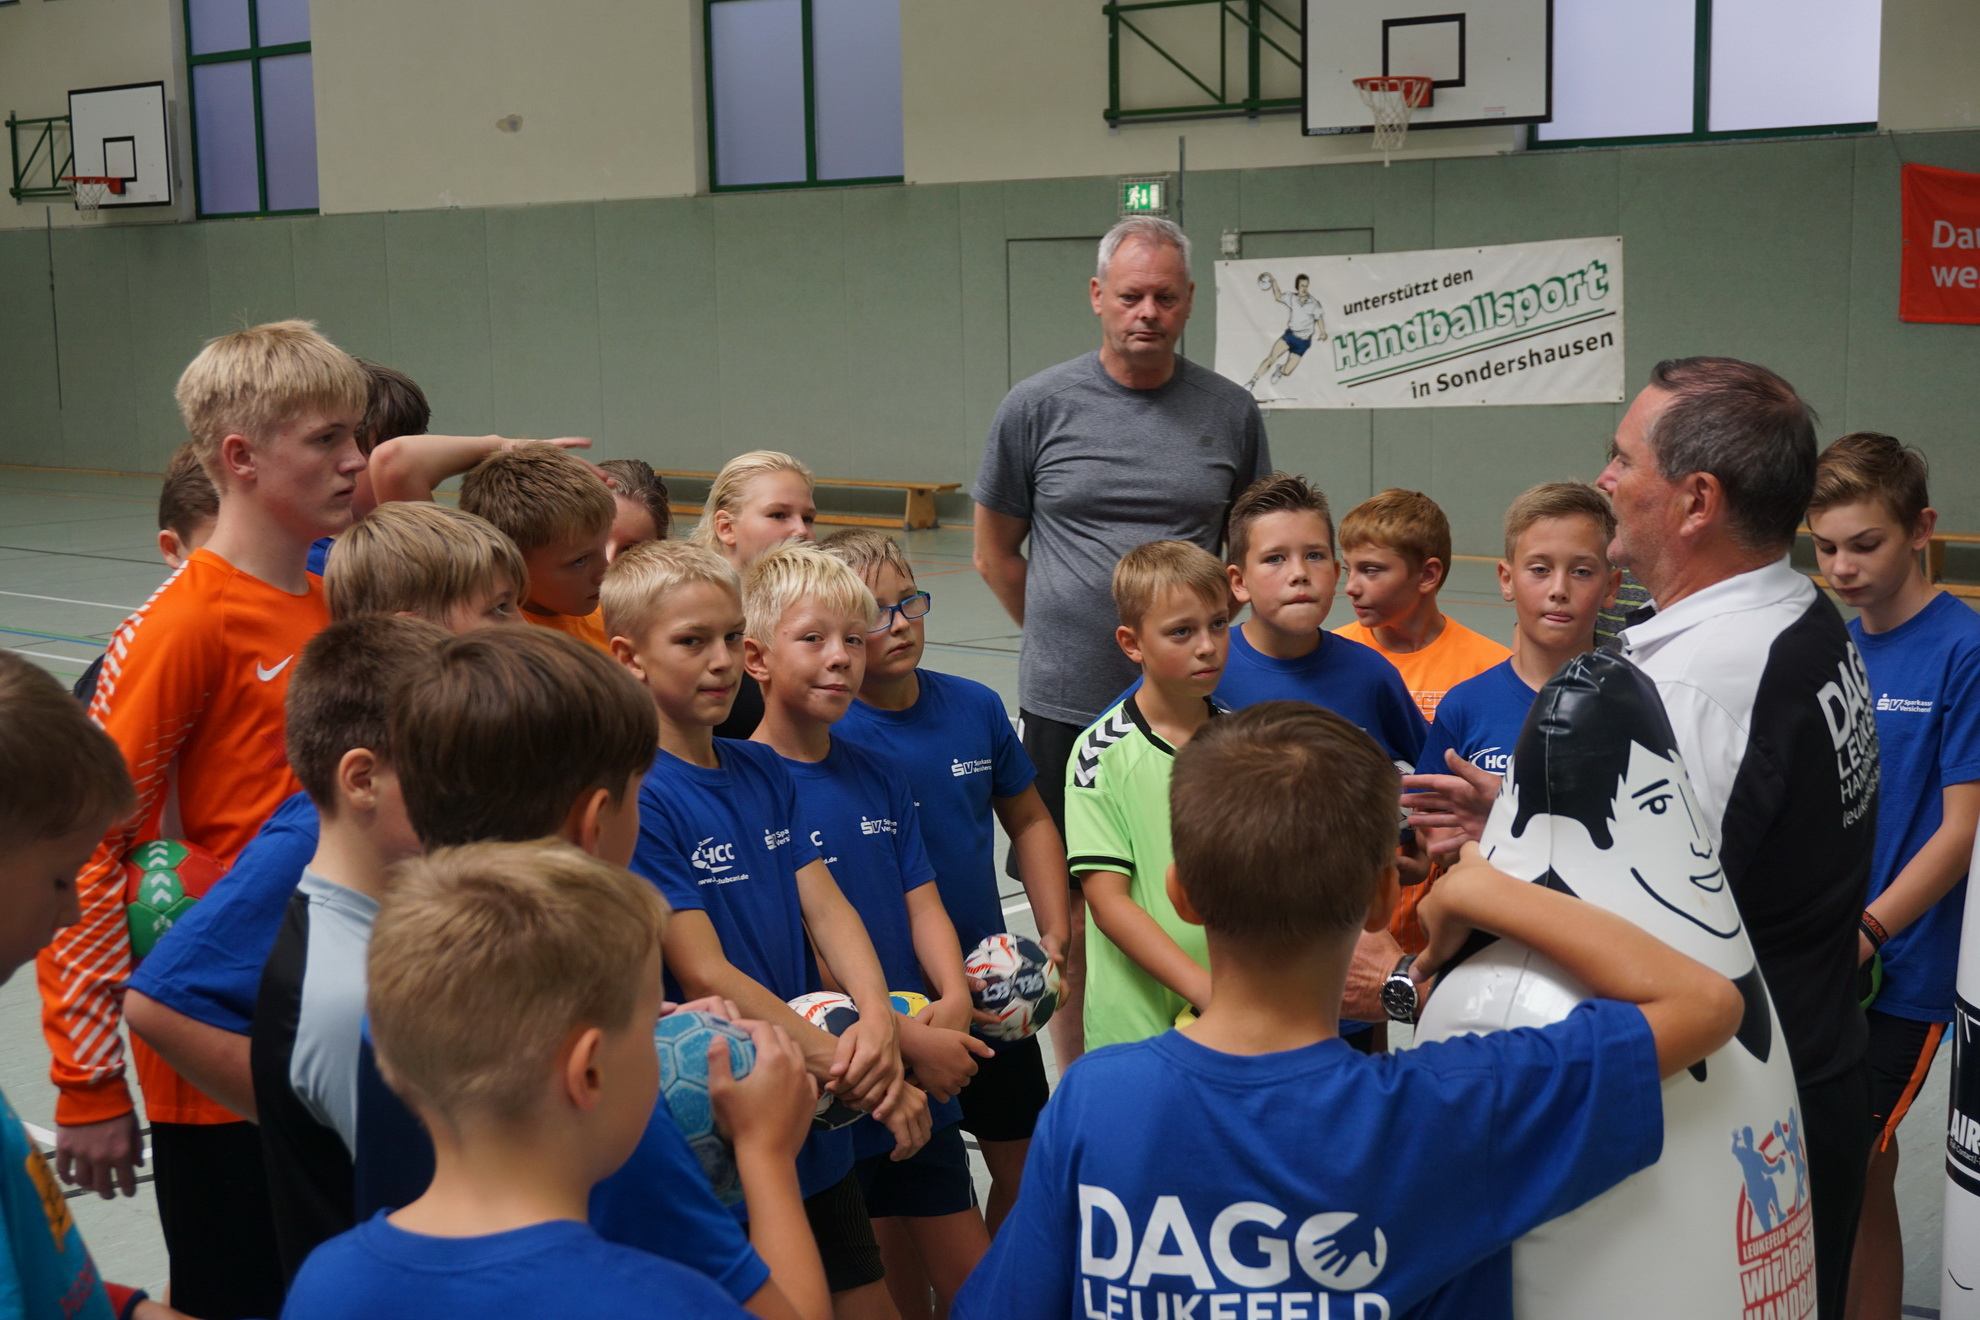 201808_Handballcamp_SDH_MG_194w